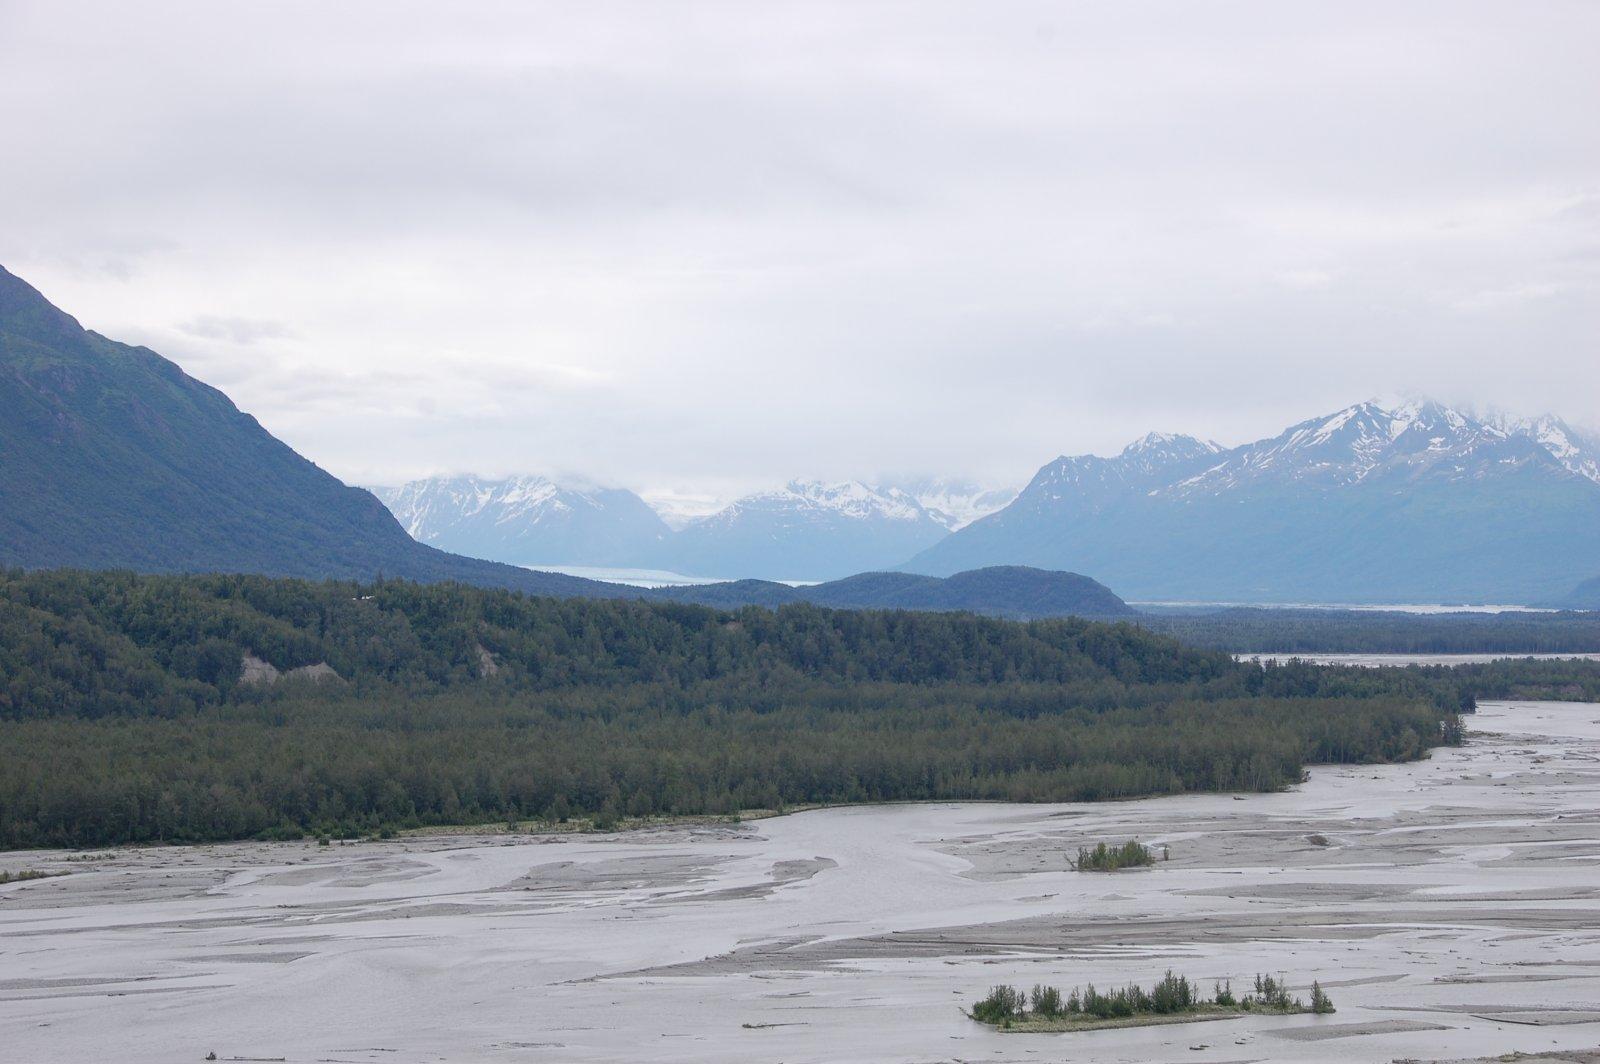 Click image for larger version  Name:Seward Alaska Aquarium 025.jpg Views:93 Size:178.7 KB ID:205696